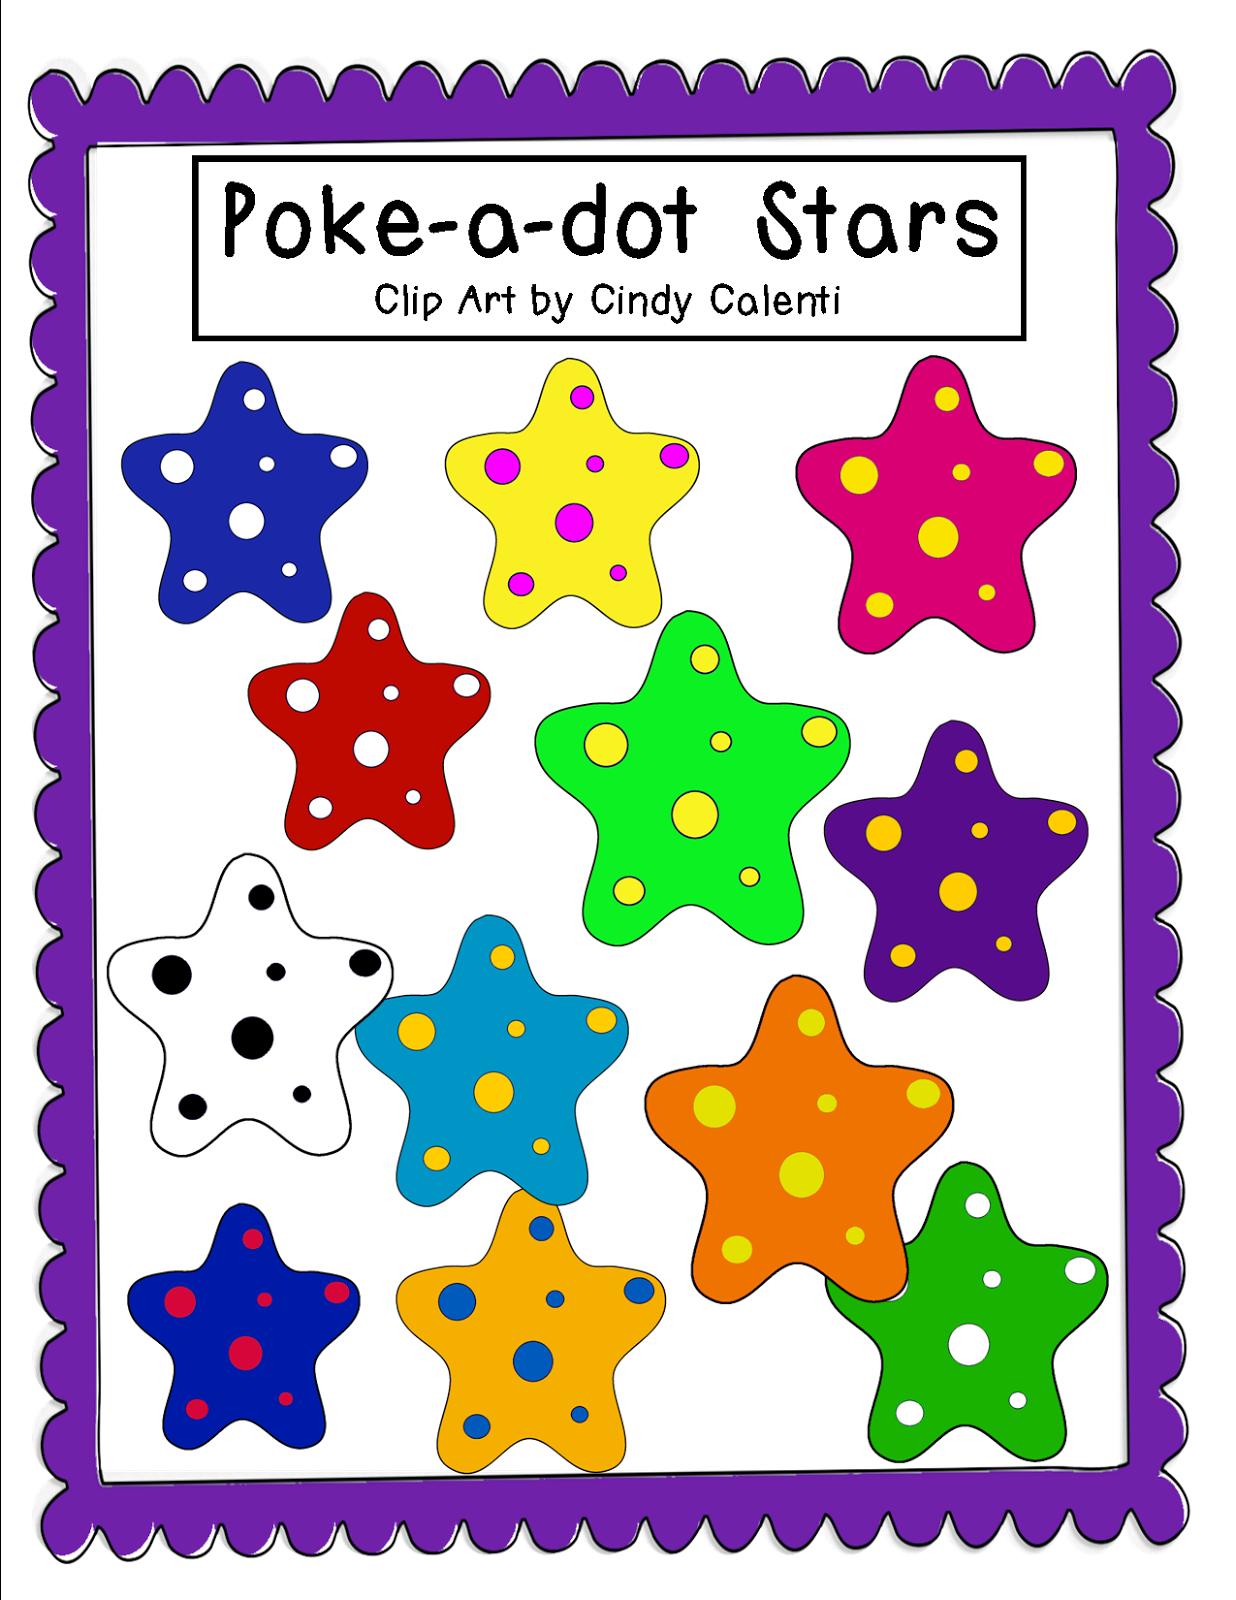 http://grannygoestoschool.blogspot.com/2014/08/poke-dot-stars-clip-art-freebie.html